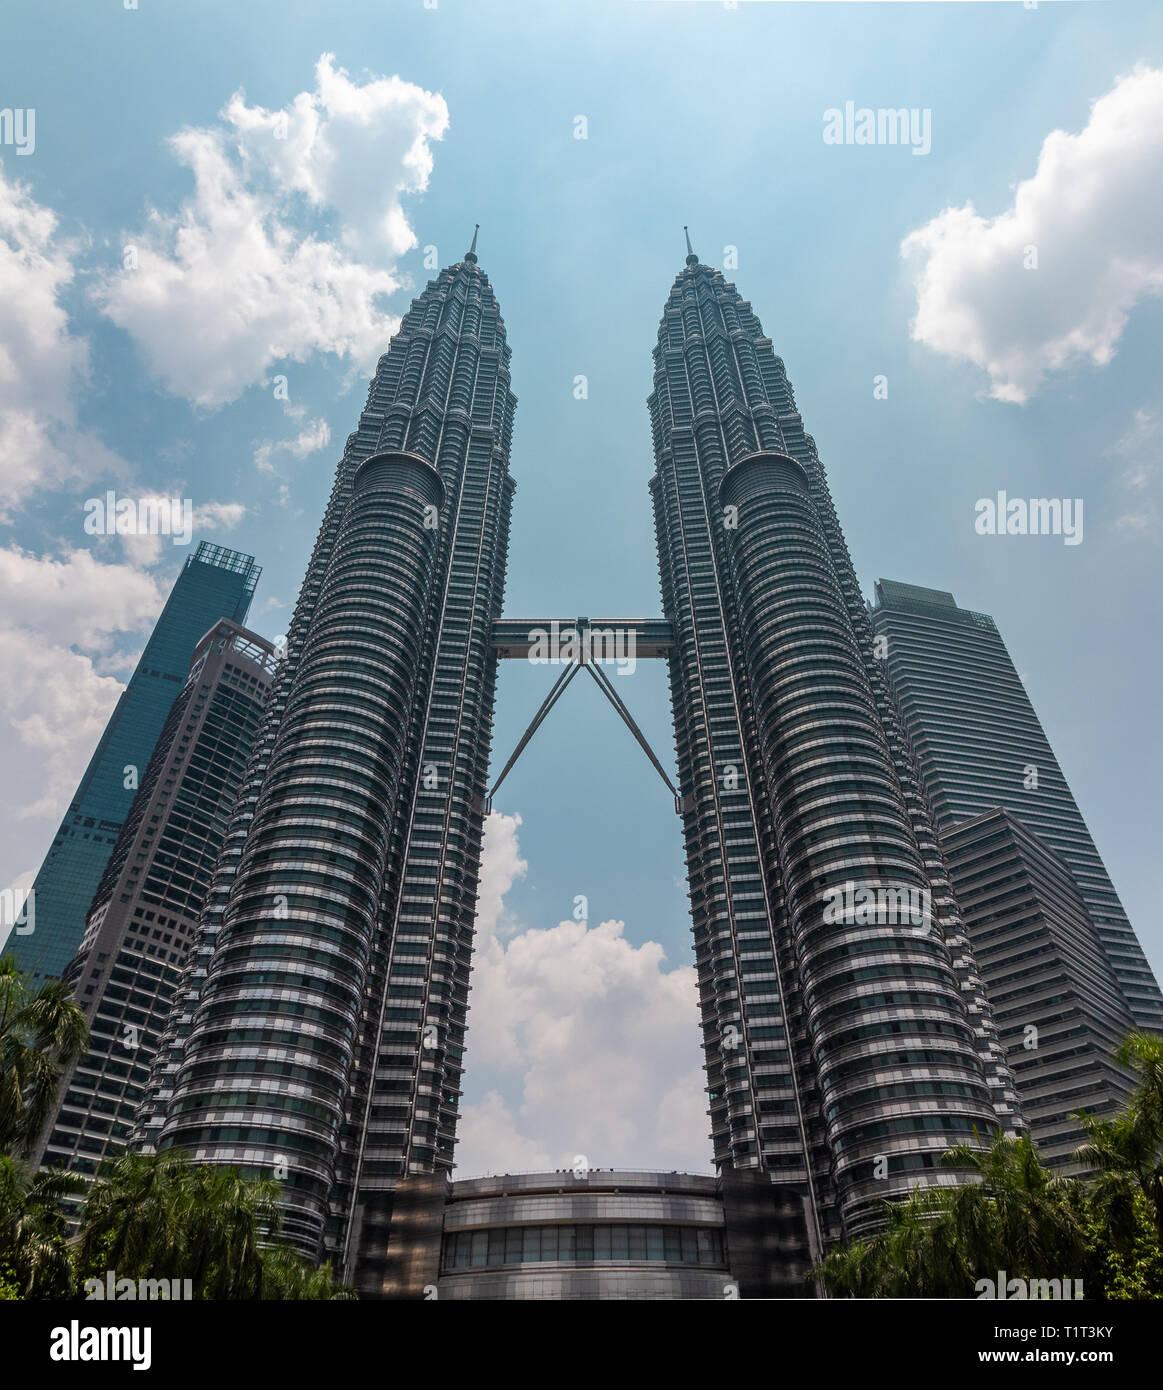 Petronas Towers in Kuala Lumpur, Malaysia. World's largest skyscraper before the opening of Burj Khalifa. - Stock Image